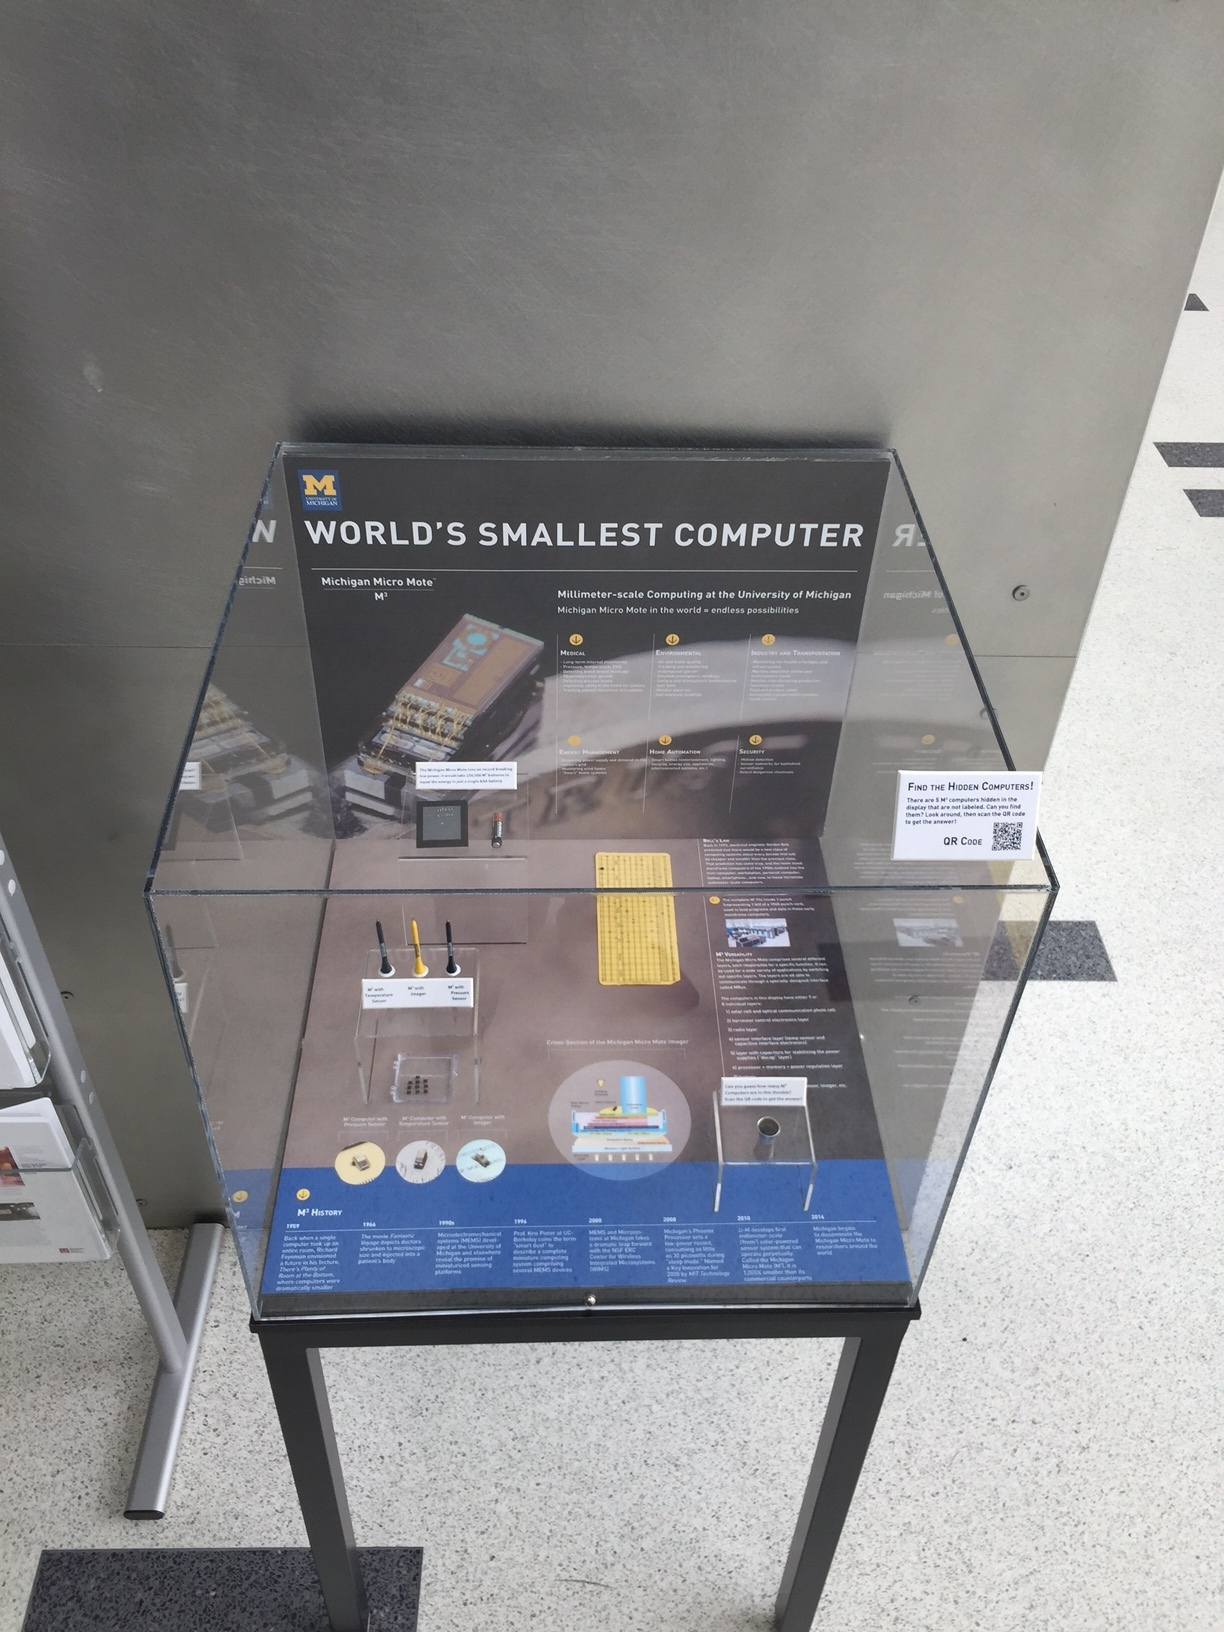 museum zeigt kleinsten computer der welt ix. Black Bedroom Furniture Sets. Home Design Ideas